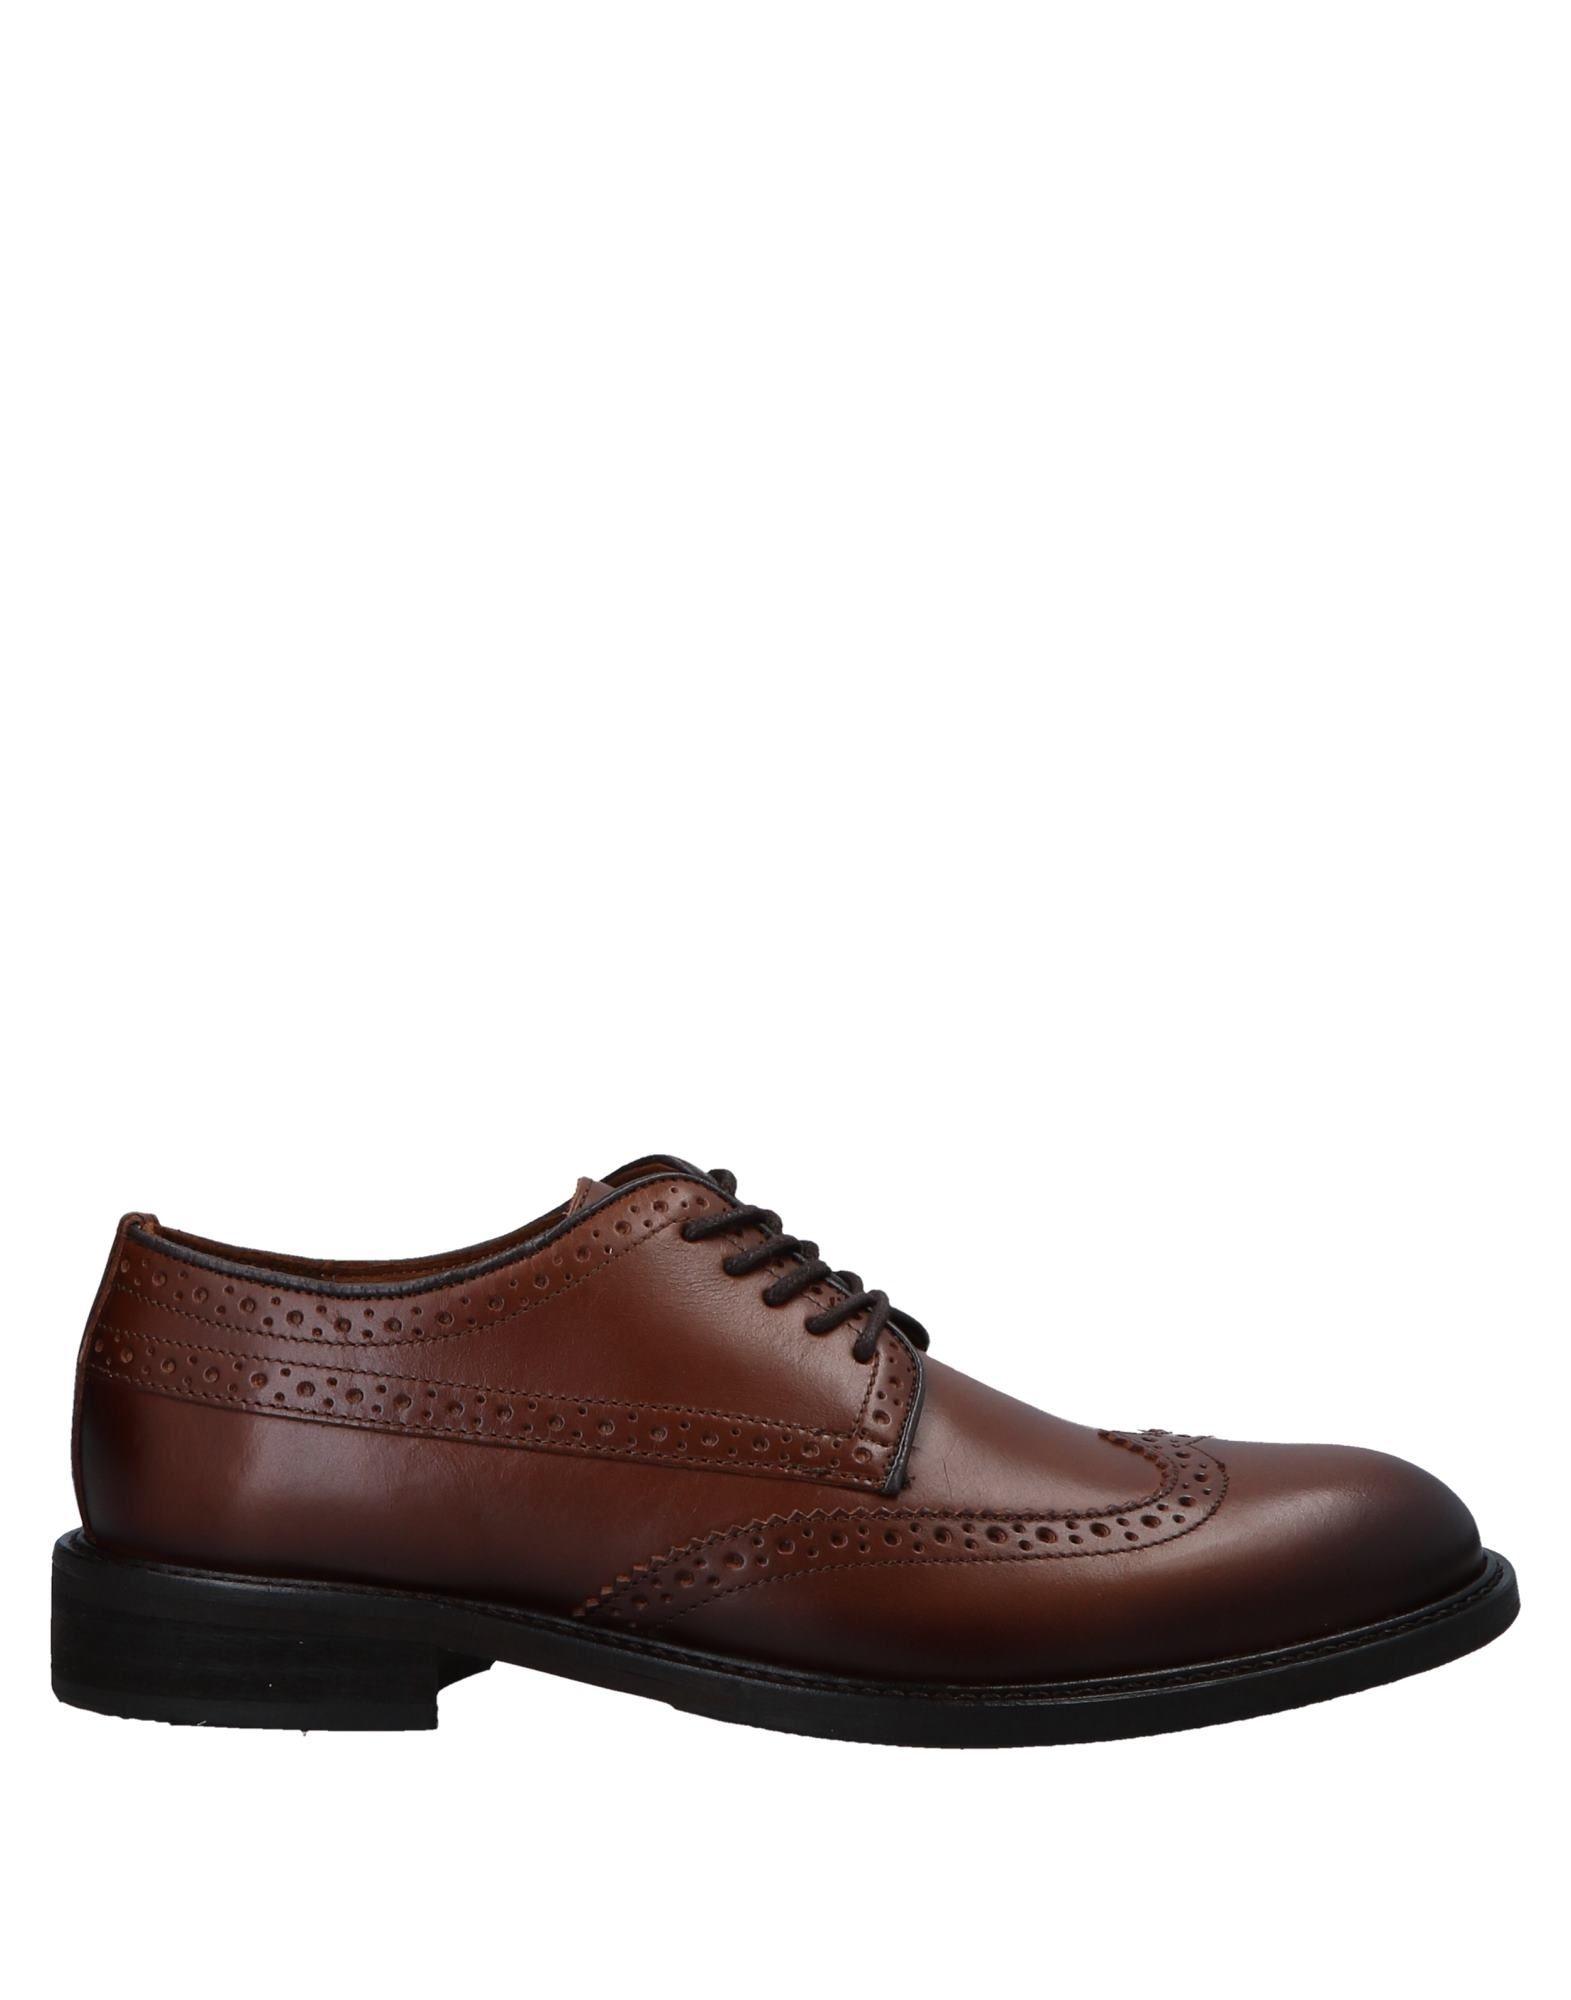 Selected Homme Schnürschuhe Herren  11552174VA Gute Qualität beliebte Schuhe